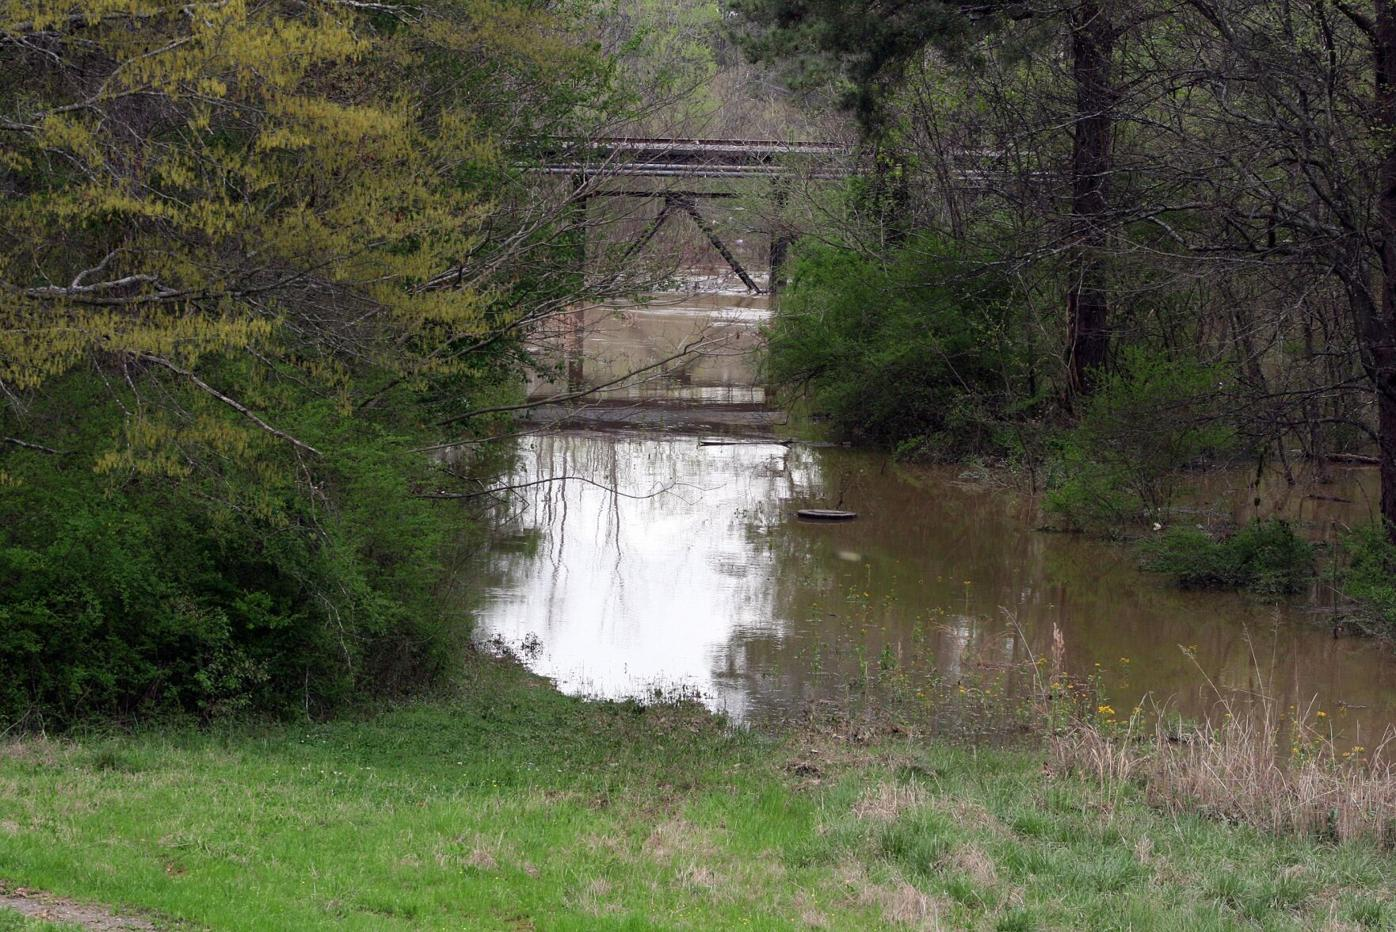 Norfolk Southern Railroad trestle